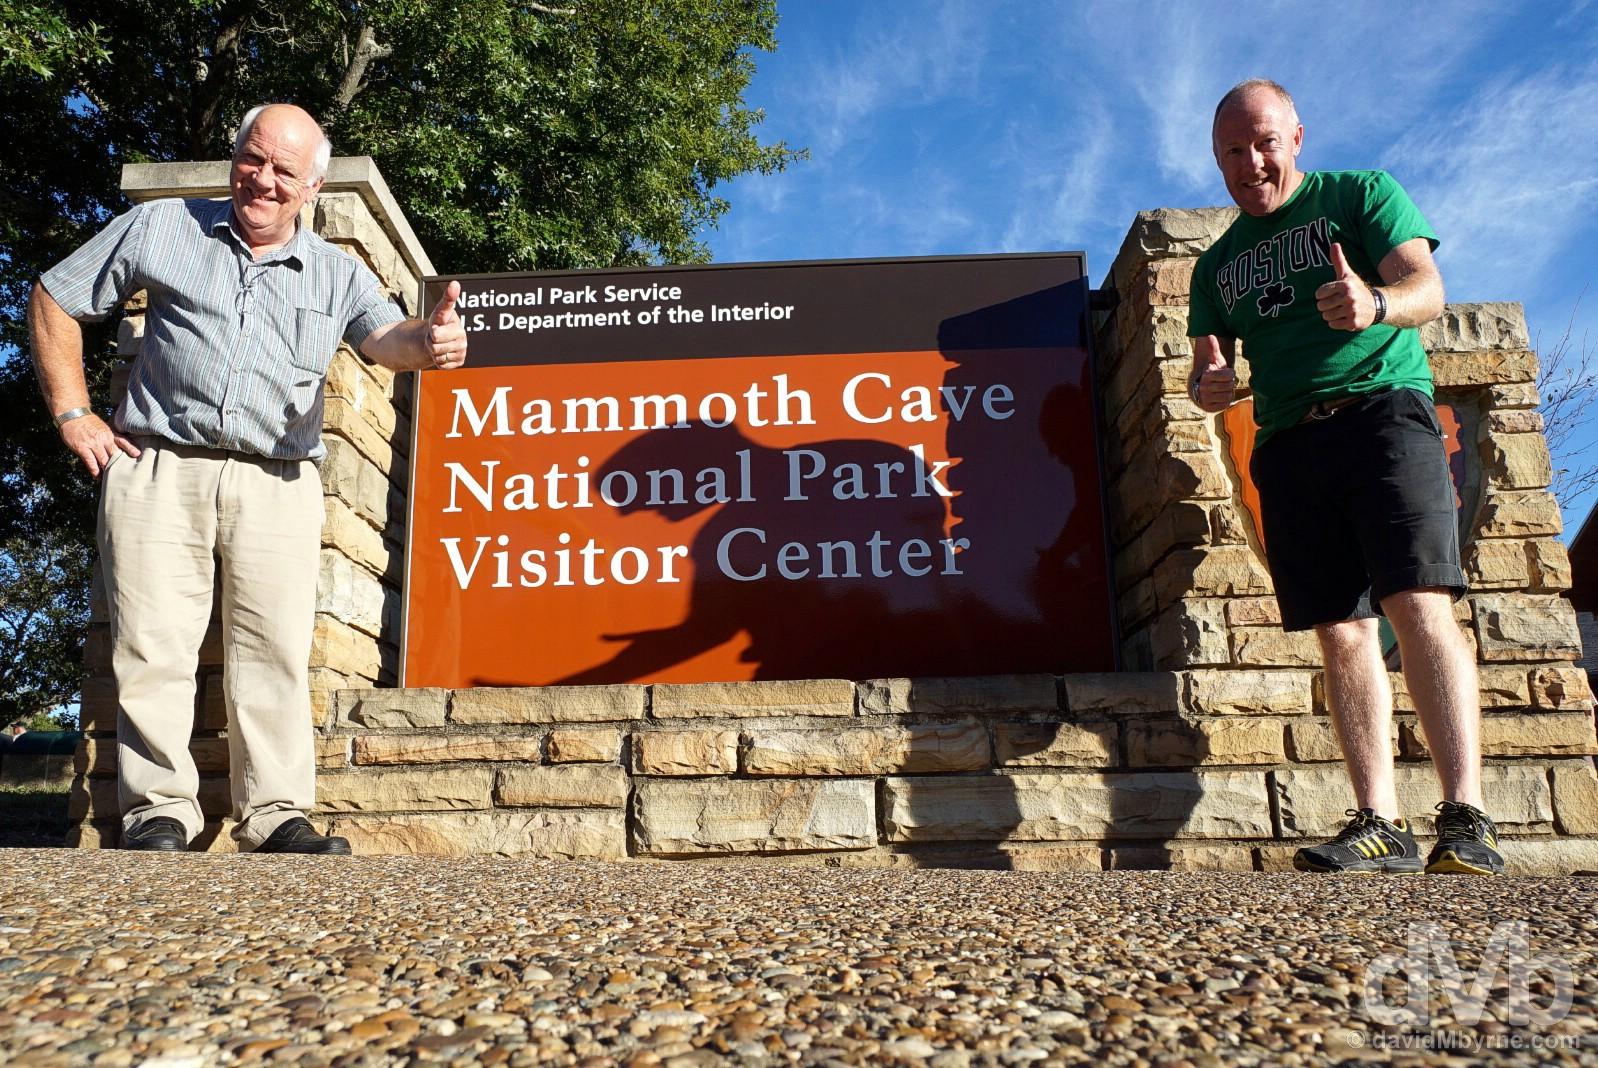 Mammoth Cave National Park, Kentucky, USA. September 27, 2016.